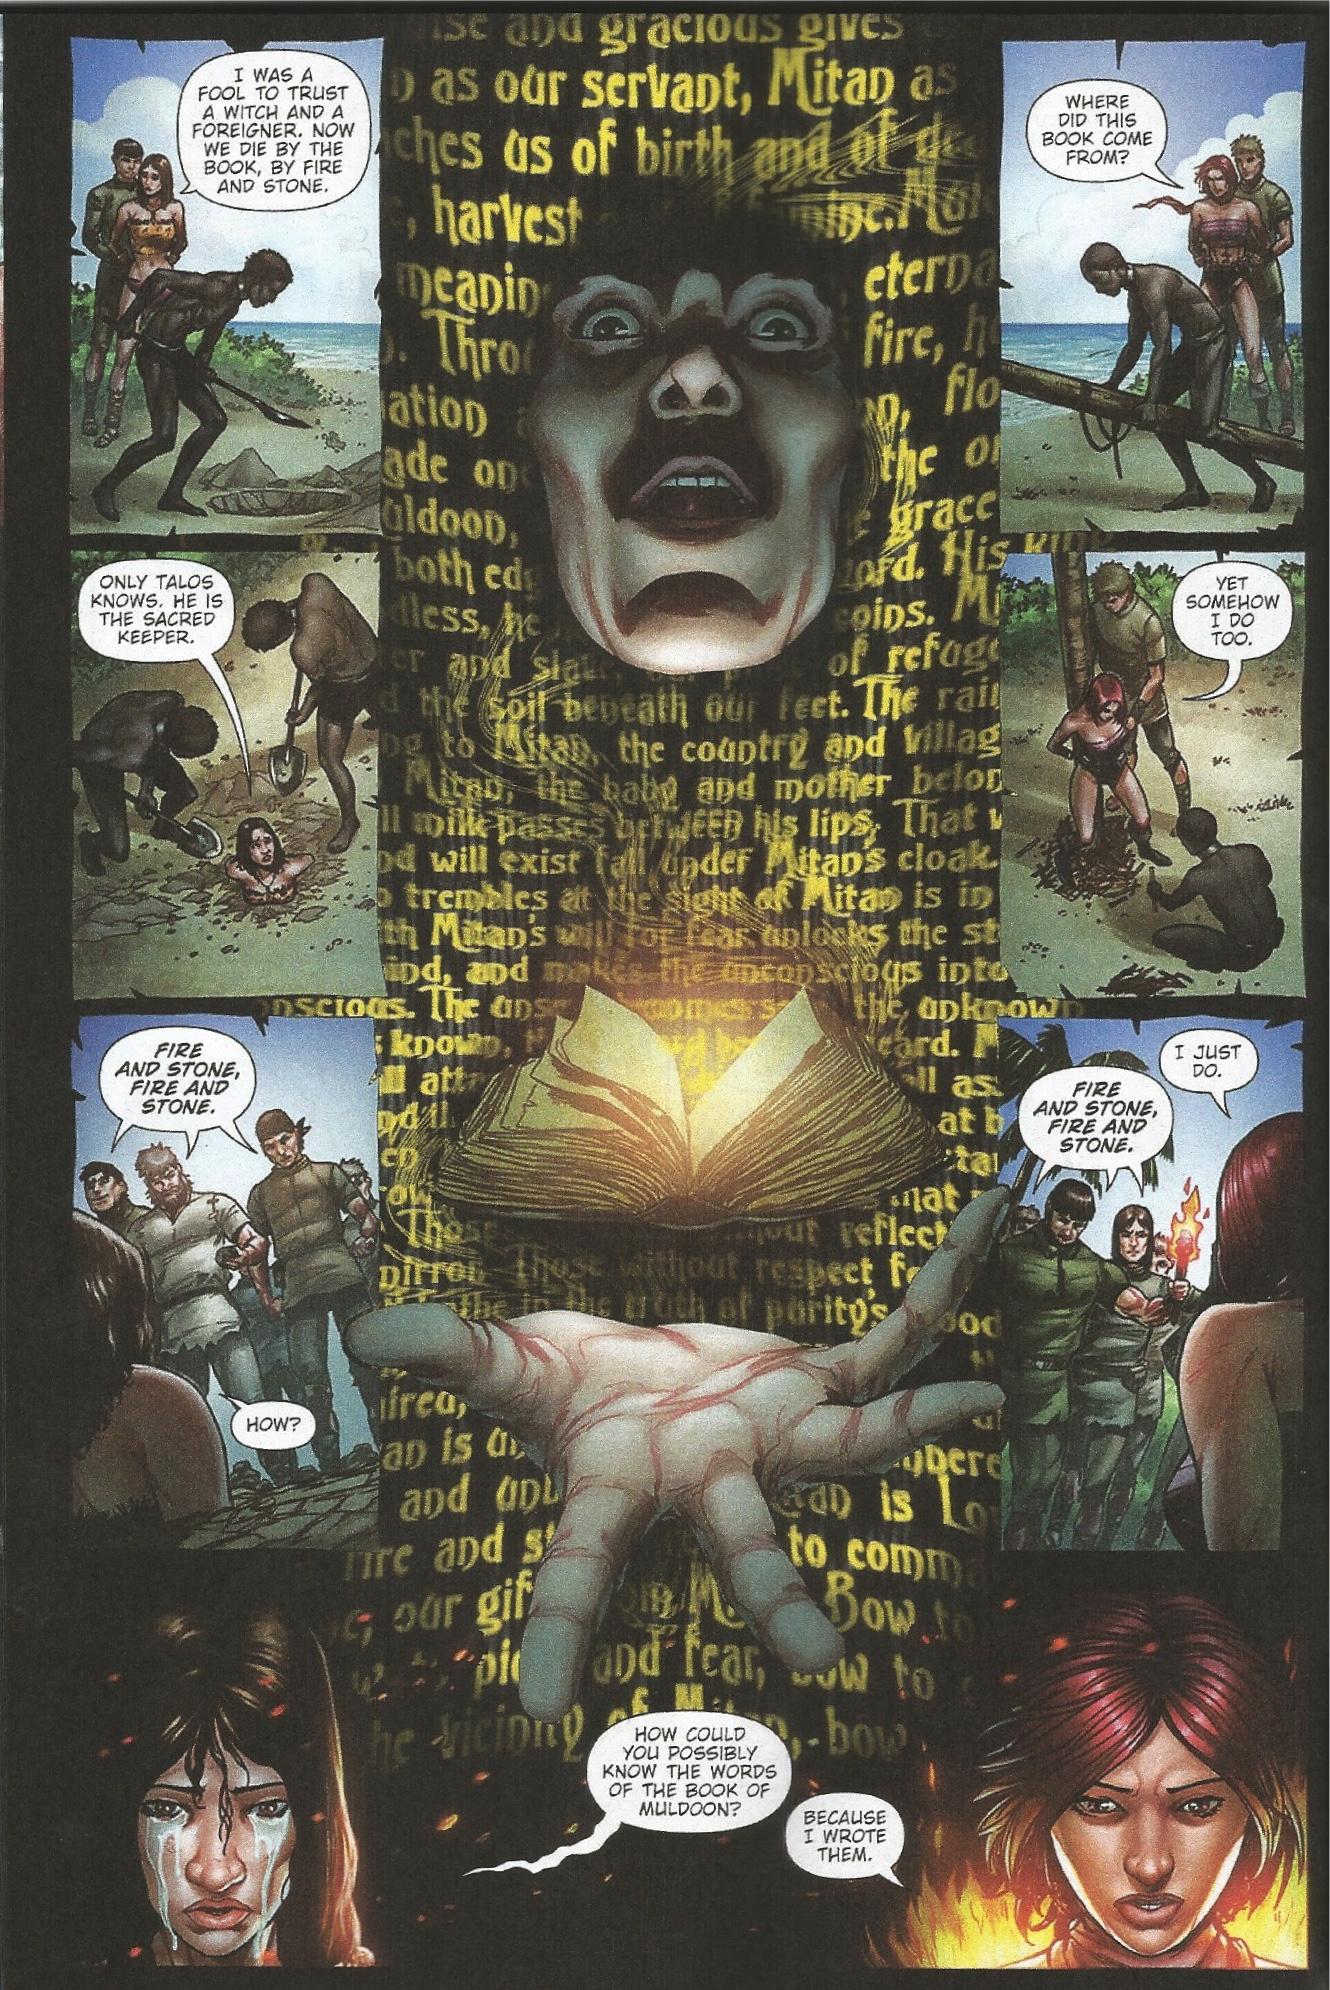 Indieic Review: Sevara  The Graphic Novel